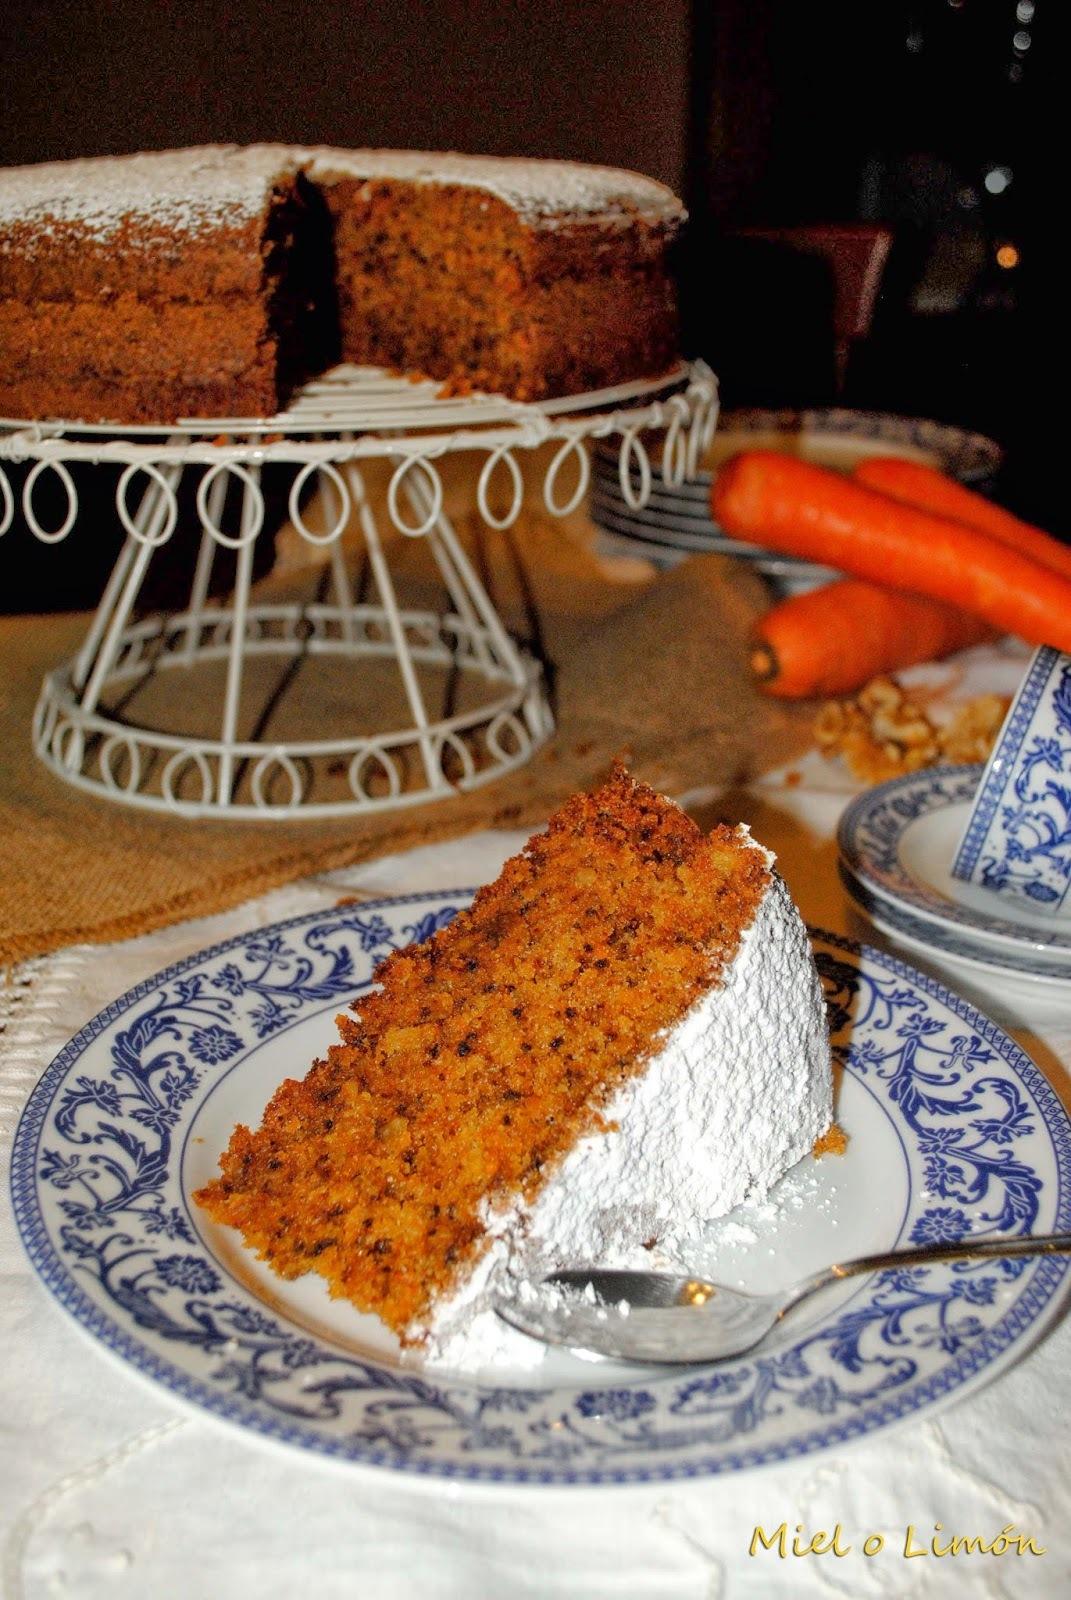 Carrot cake / Bizcocho de zanahoria